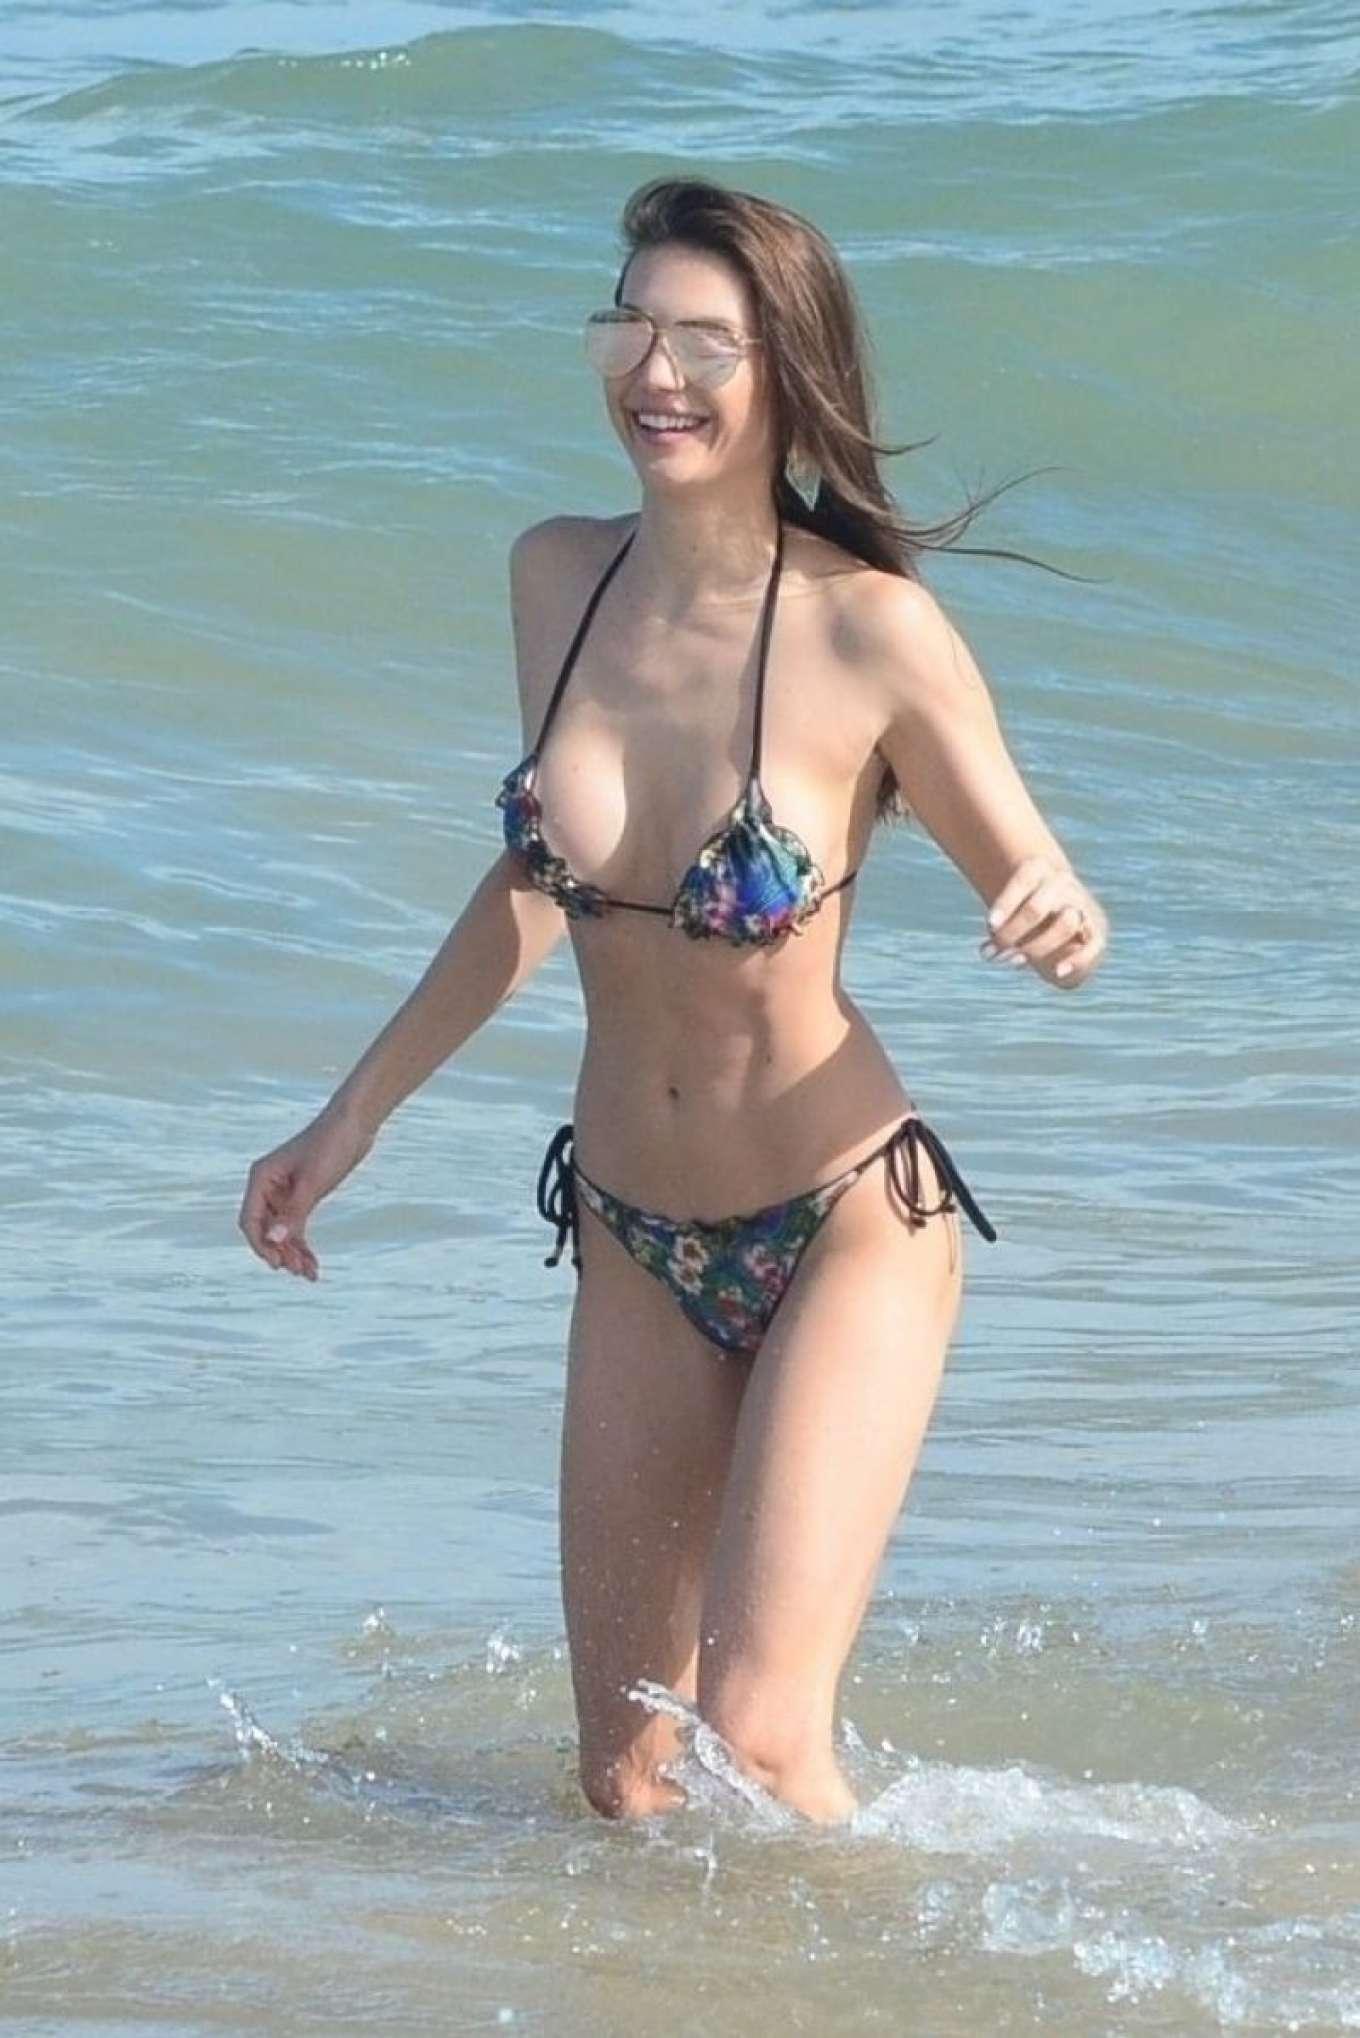 Julia Pereira nude (74 fotos) Leaked, Twitter, cameltoe